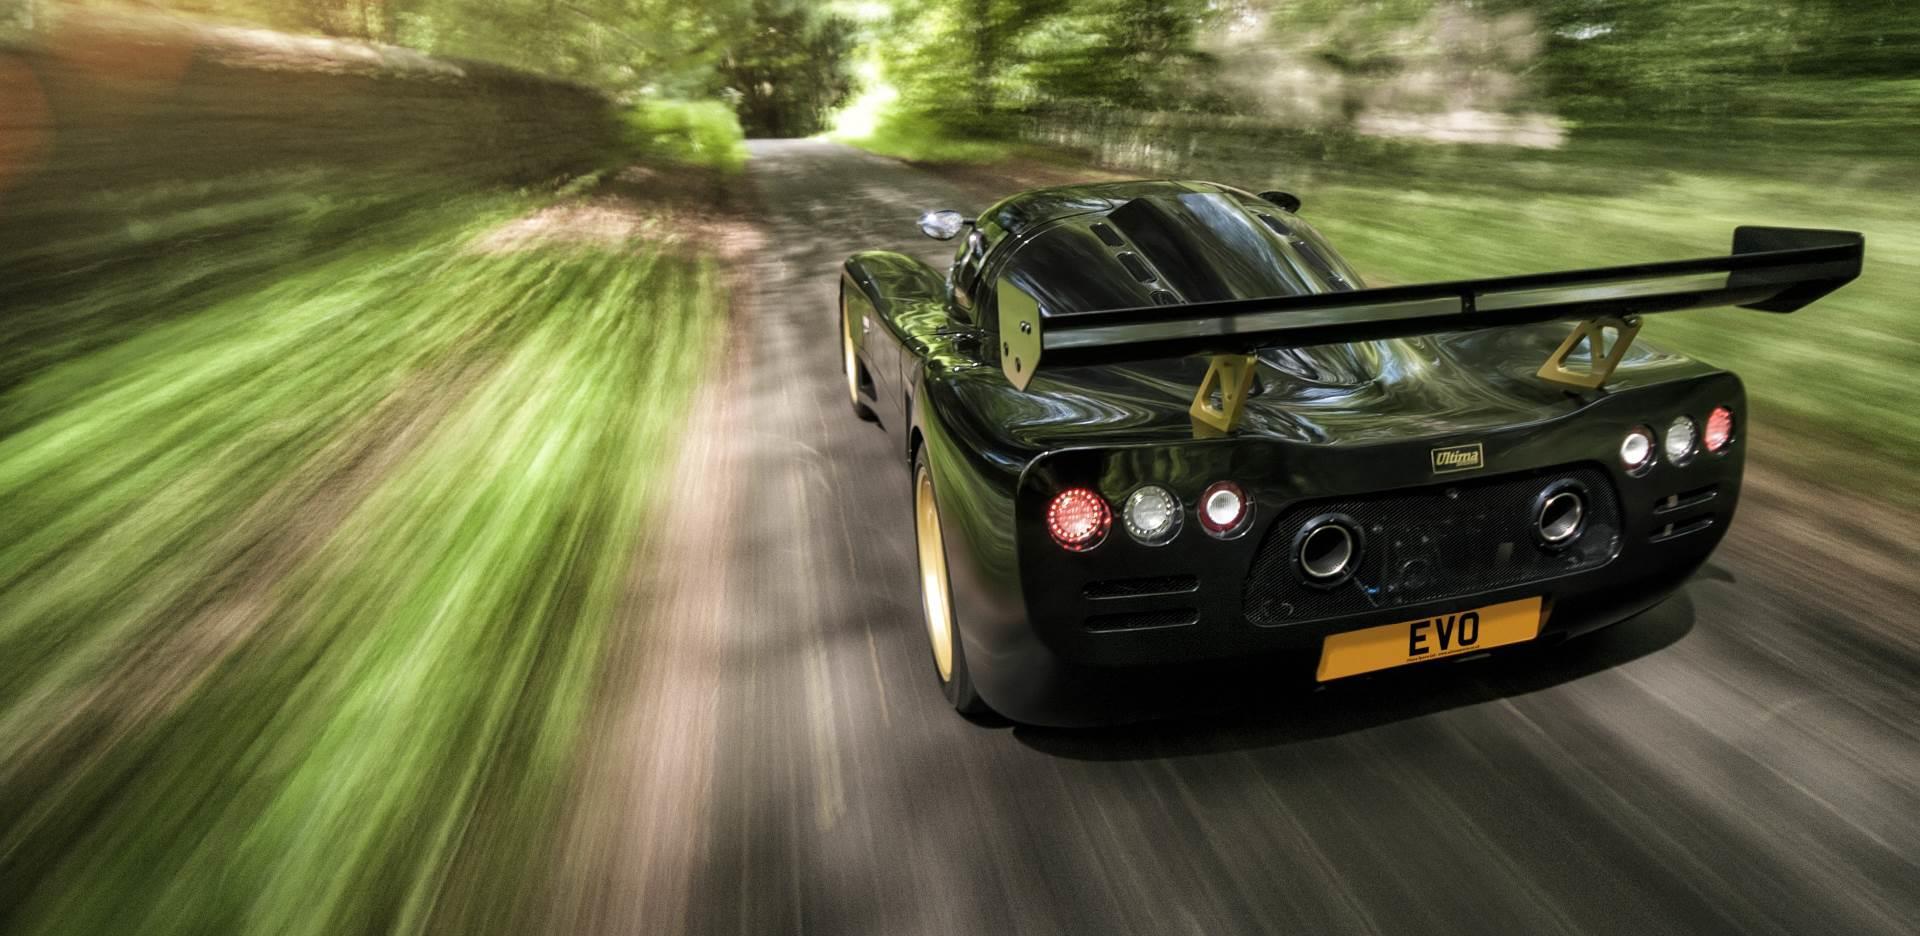 The Ultima EVO Coupe